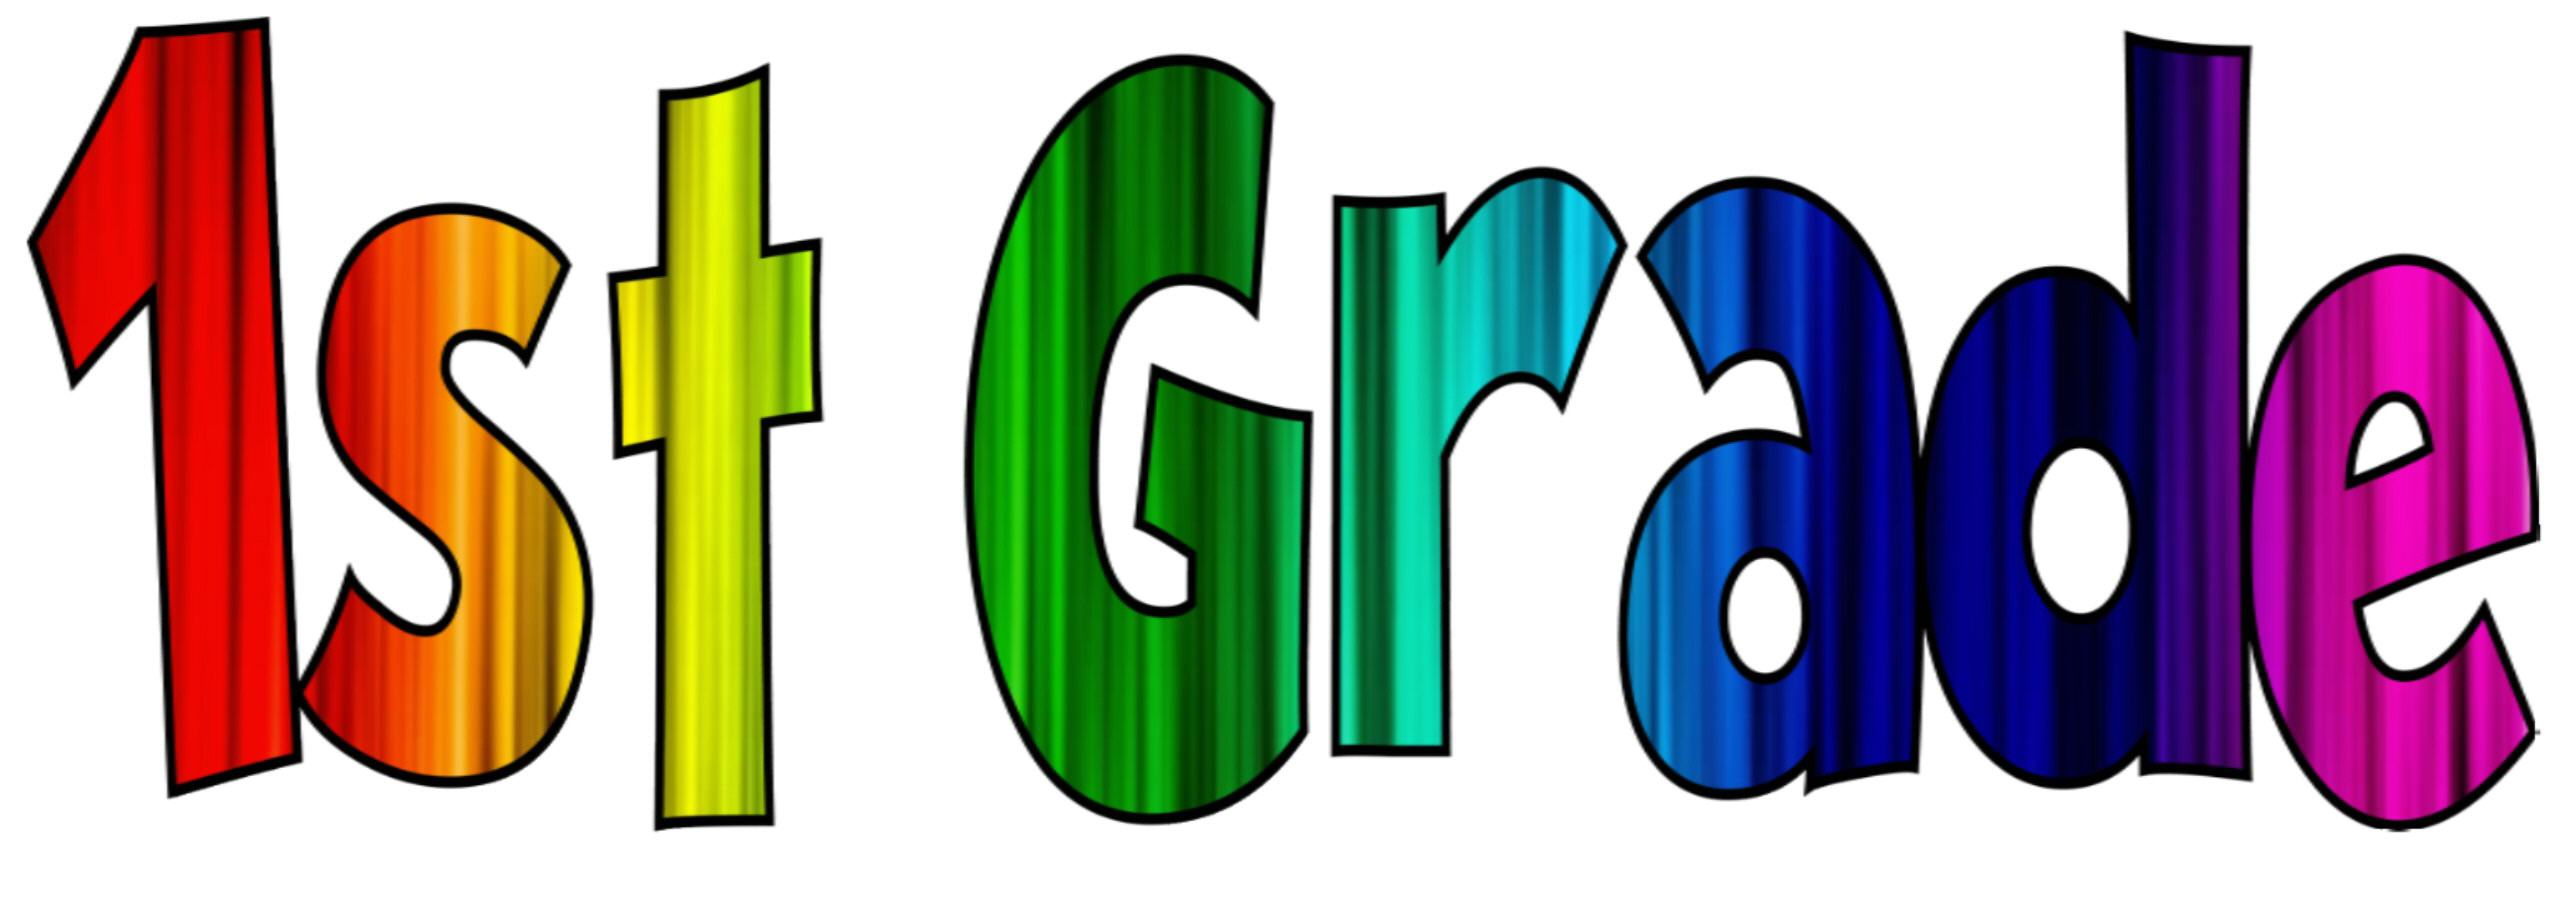 2550x919 1st Grade Clip Art